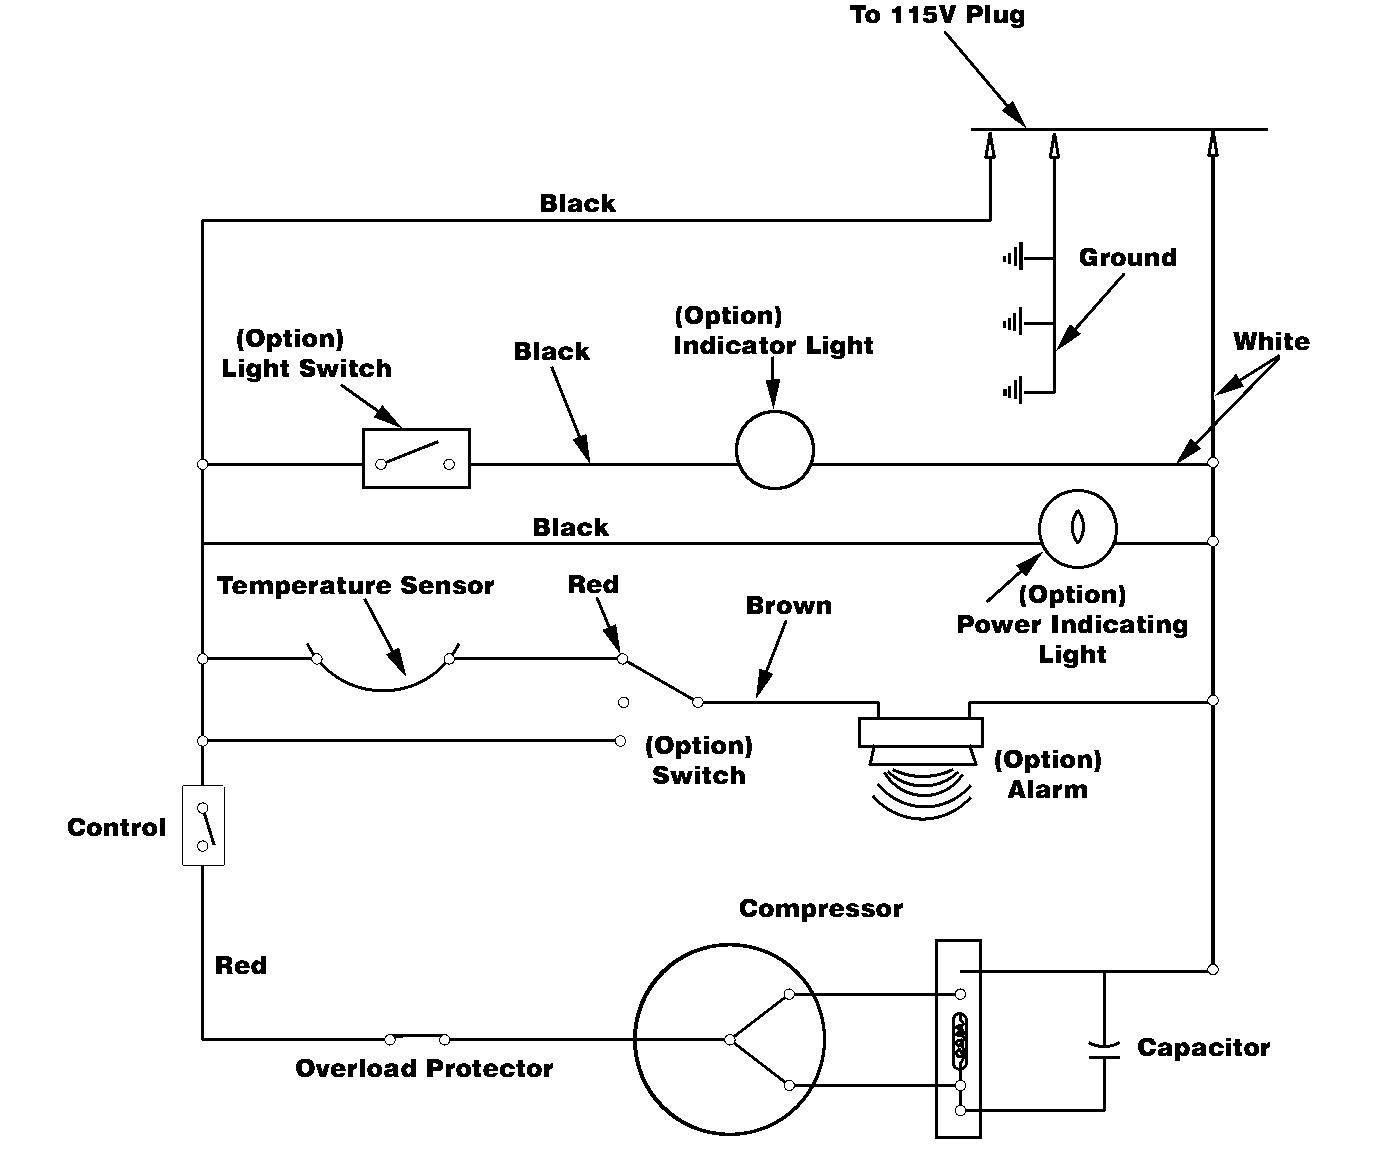 M0402352 00005?resize\=665%2C556 diagrams 7911024 lennox electric heater wiring diagram lennox lennox electric furnace wiring diagram at sewacar.co